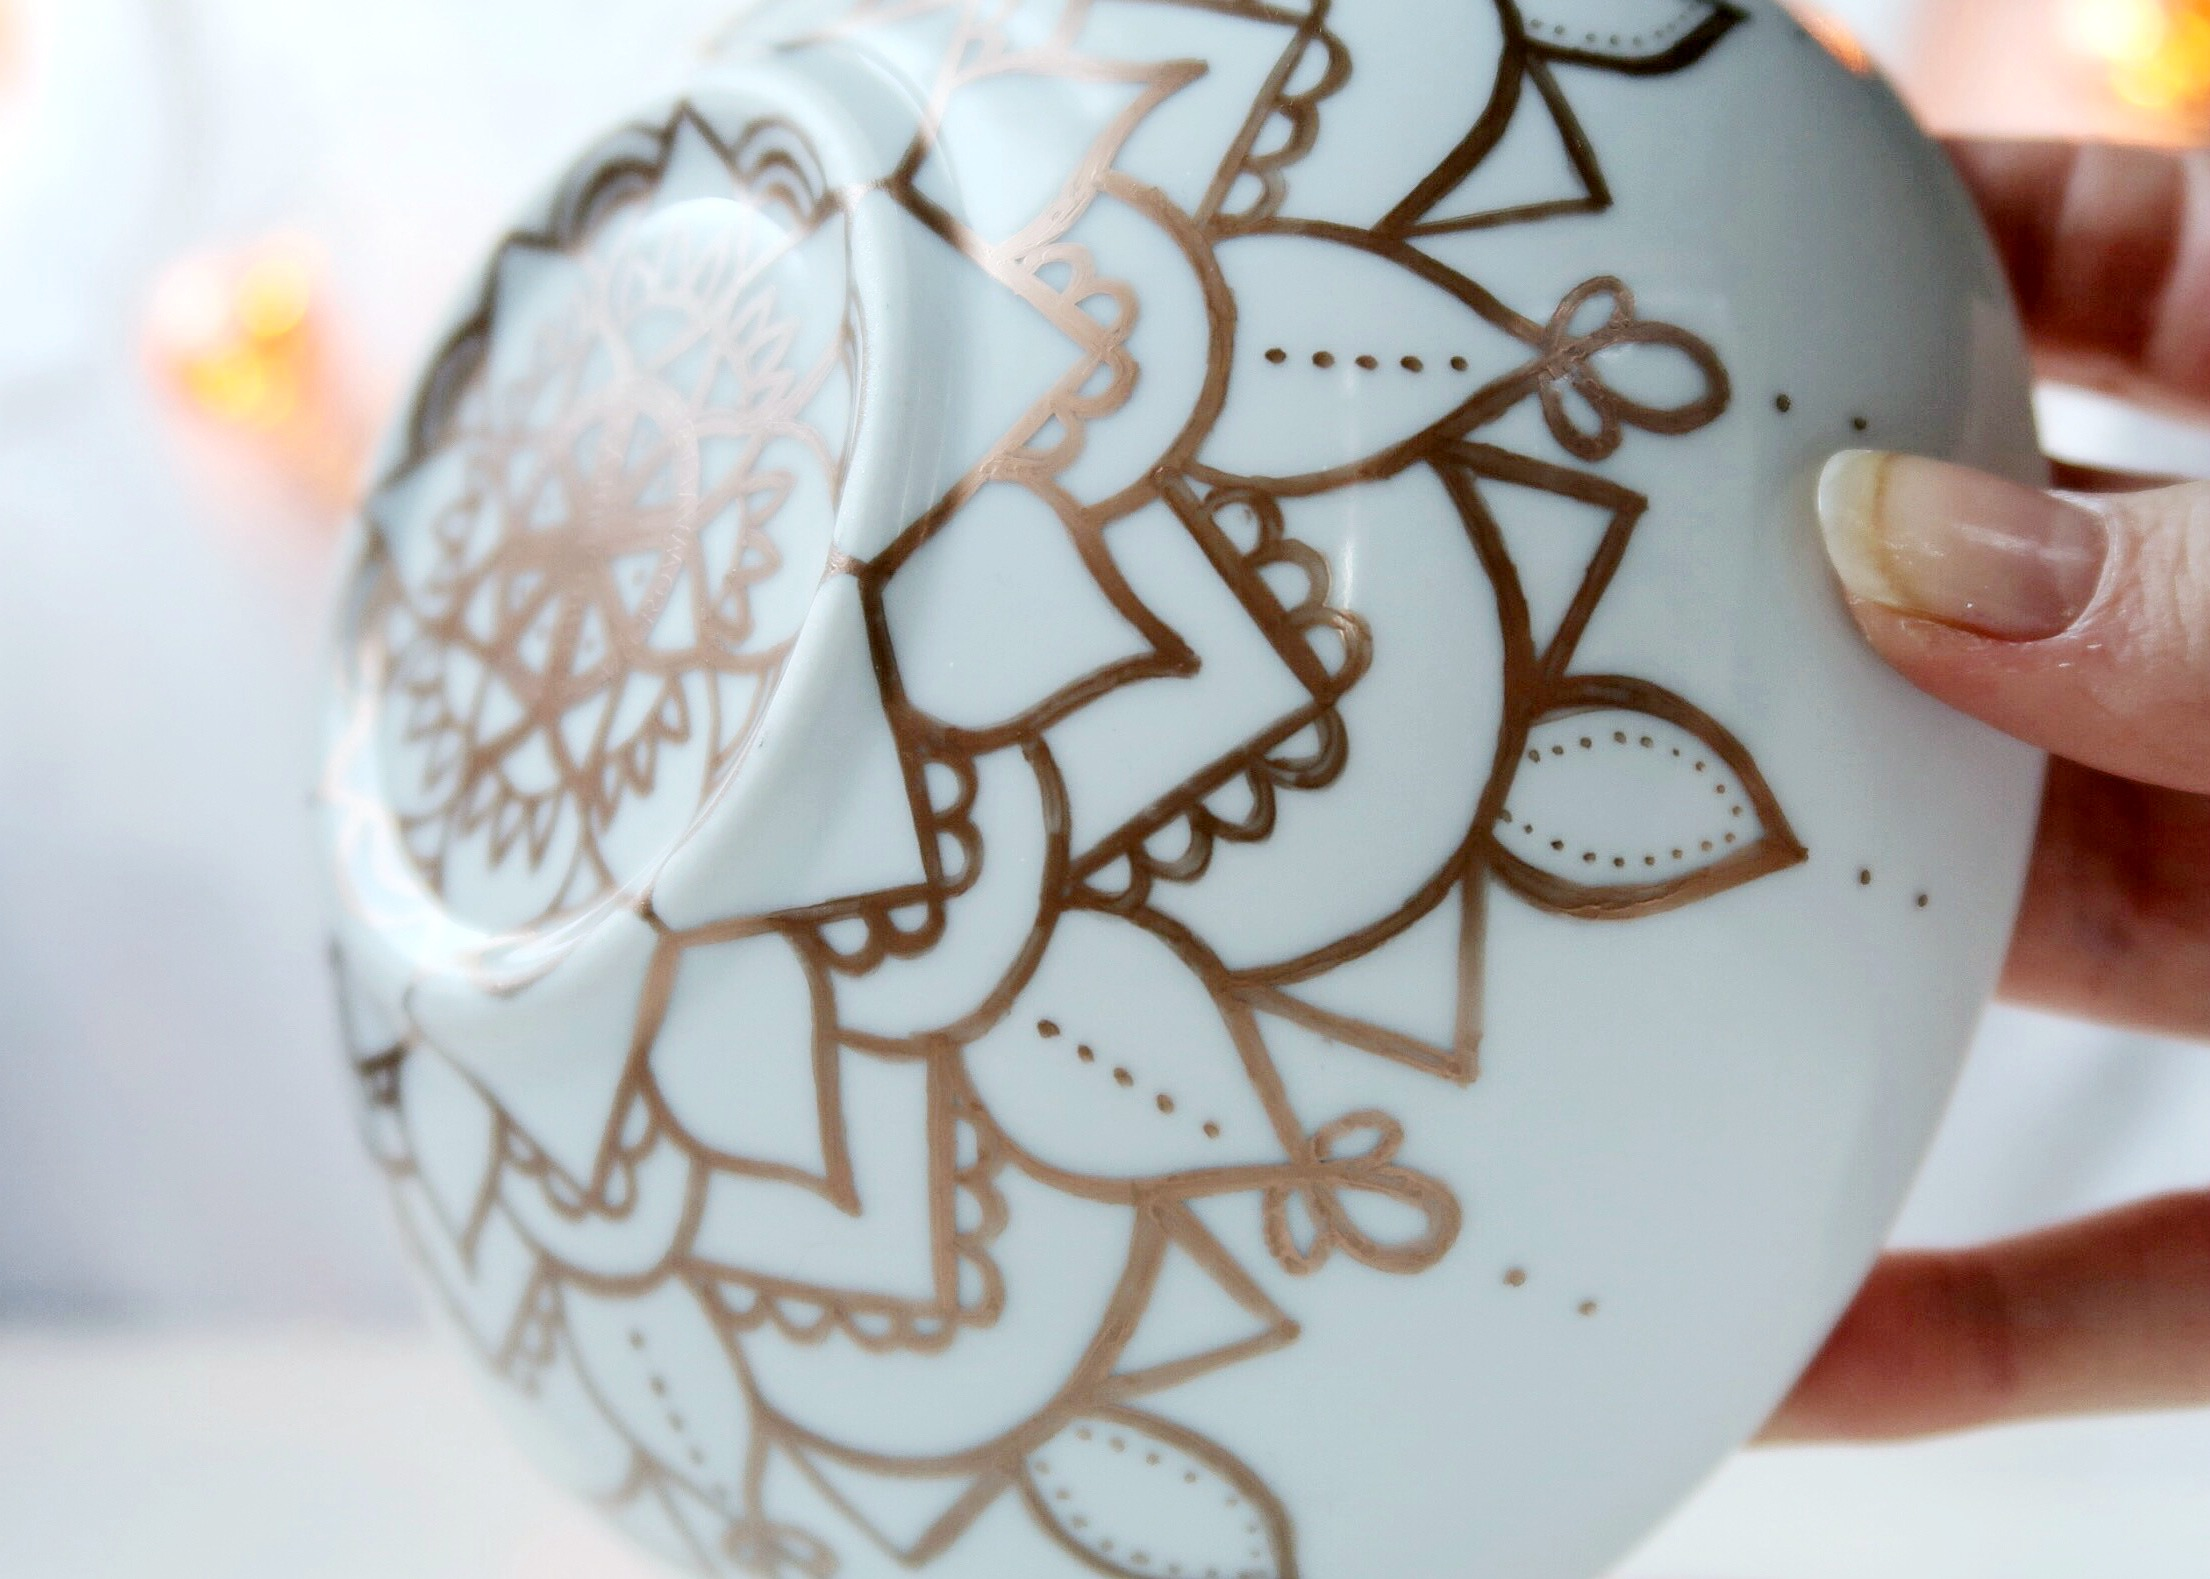 DIY Sharpie Mandala Bowl by Isoscella